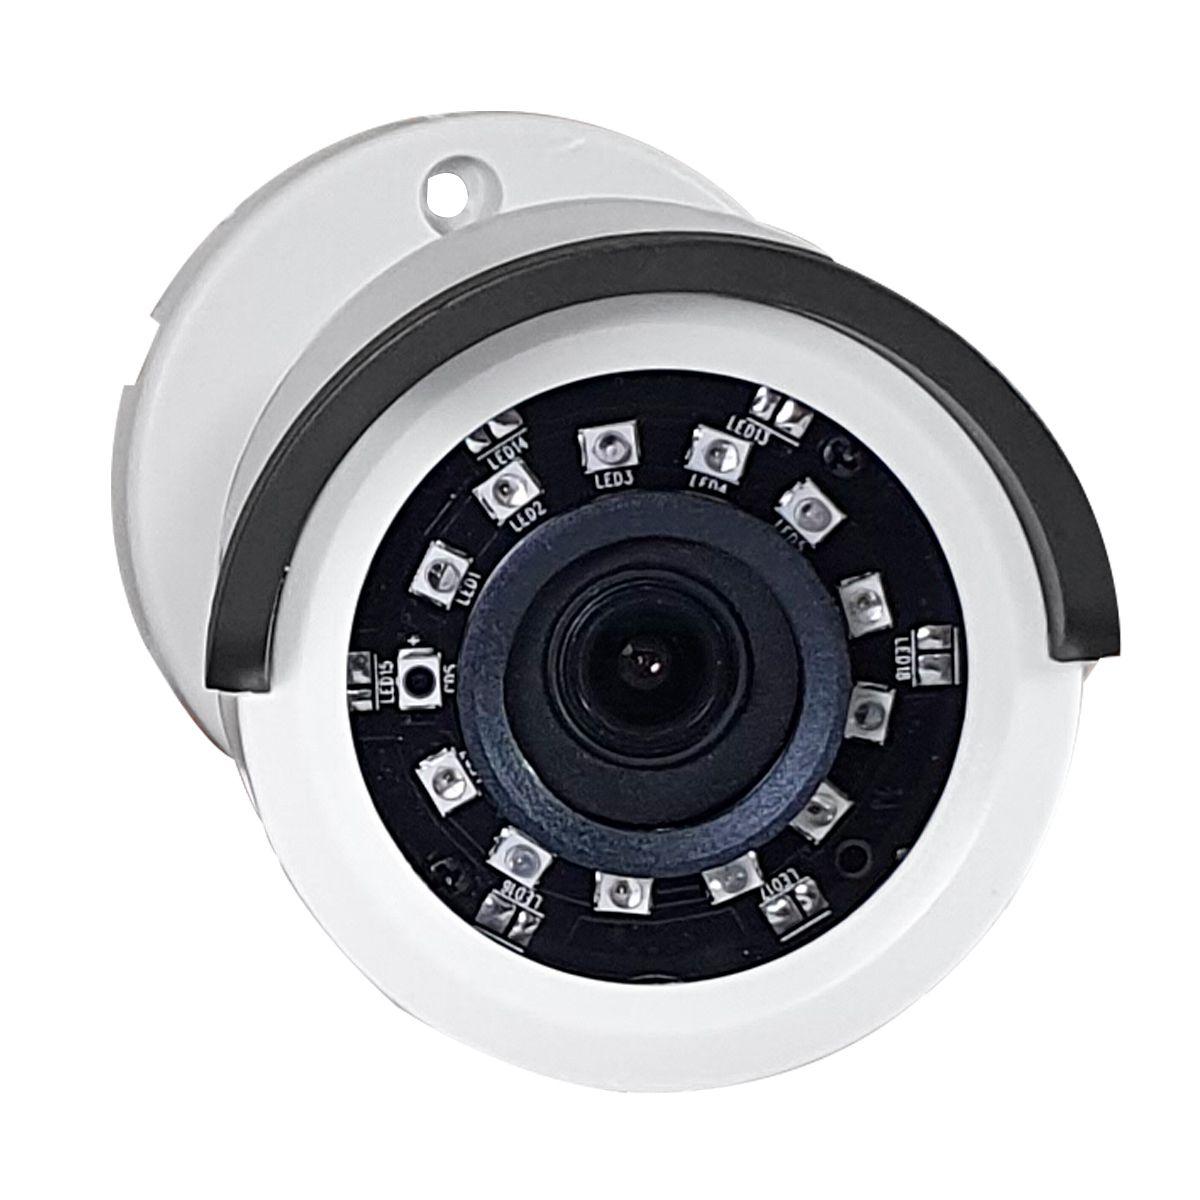 Câmera Full HD 2MP Super Starvis GS0055 Giga Security - Enxerga colorida no escuro  - Tudo Forte